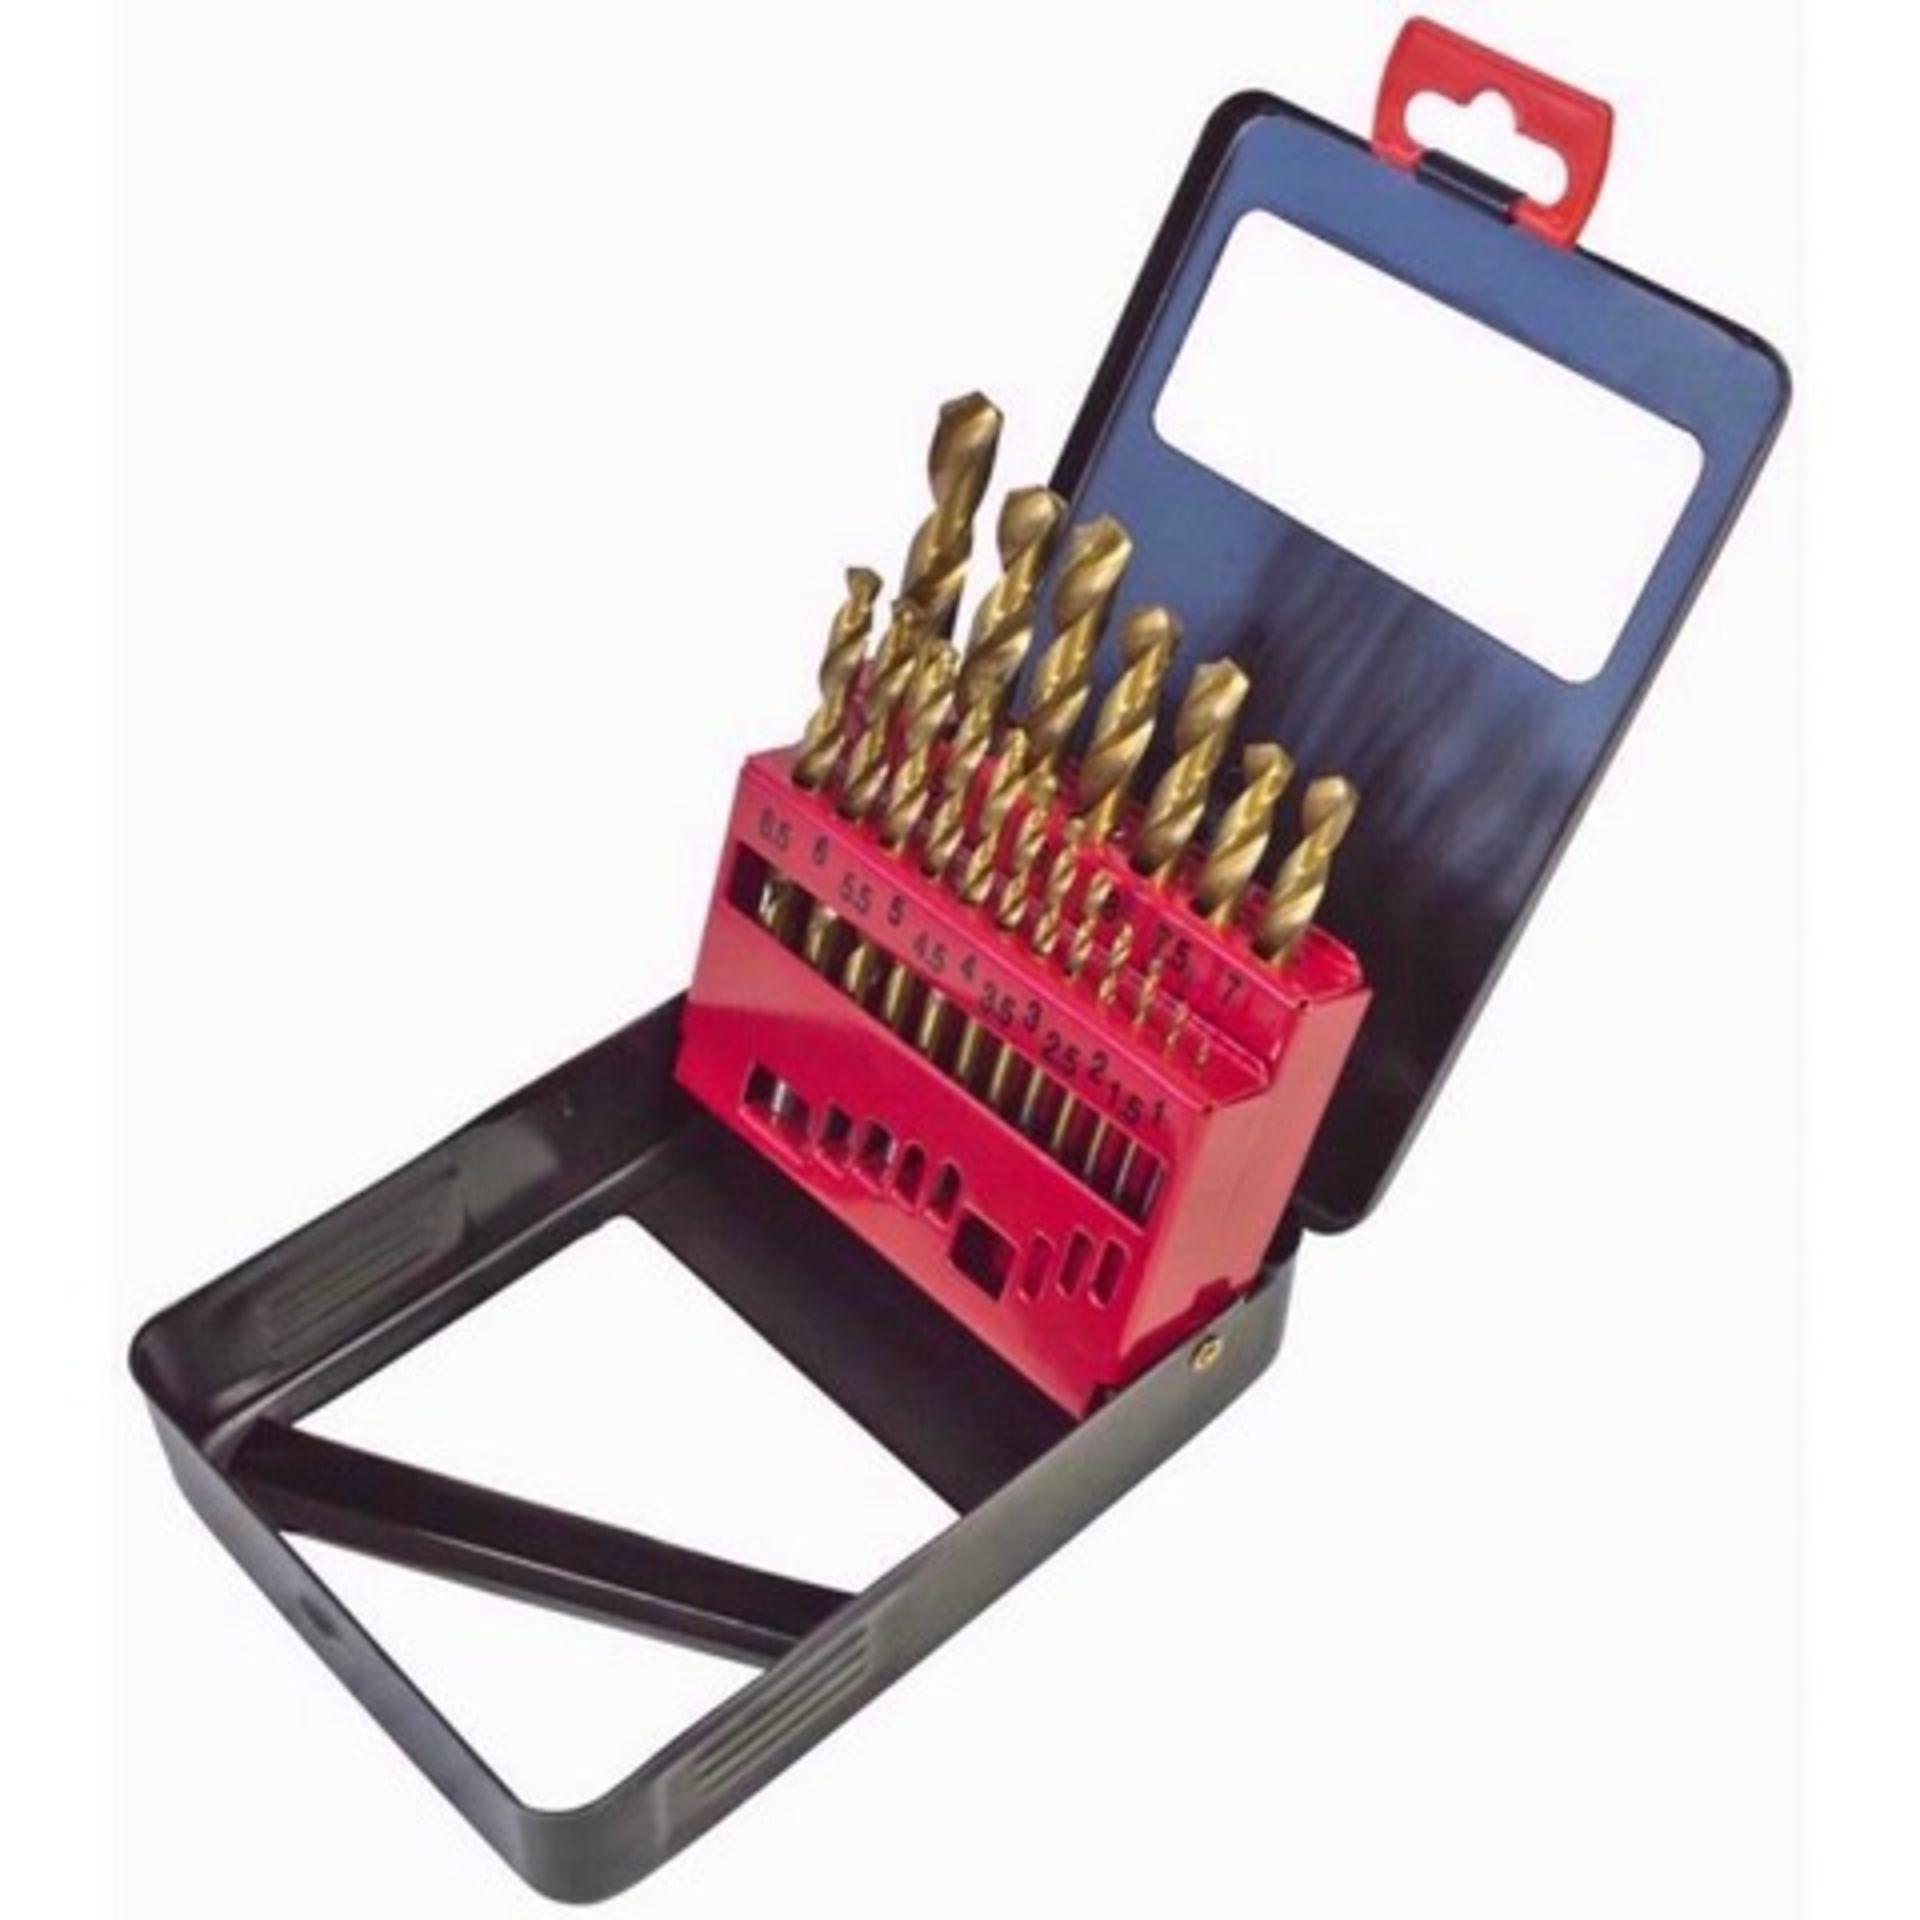 Lot 12989 - + VAT Brand New Nineteen Piece Titanium Coated Drill Bit Set